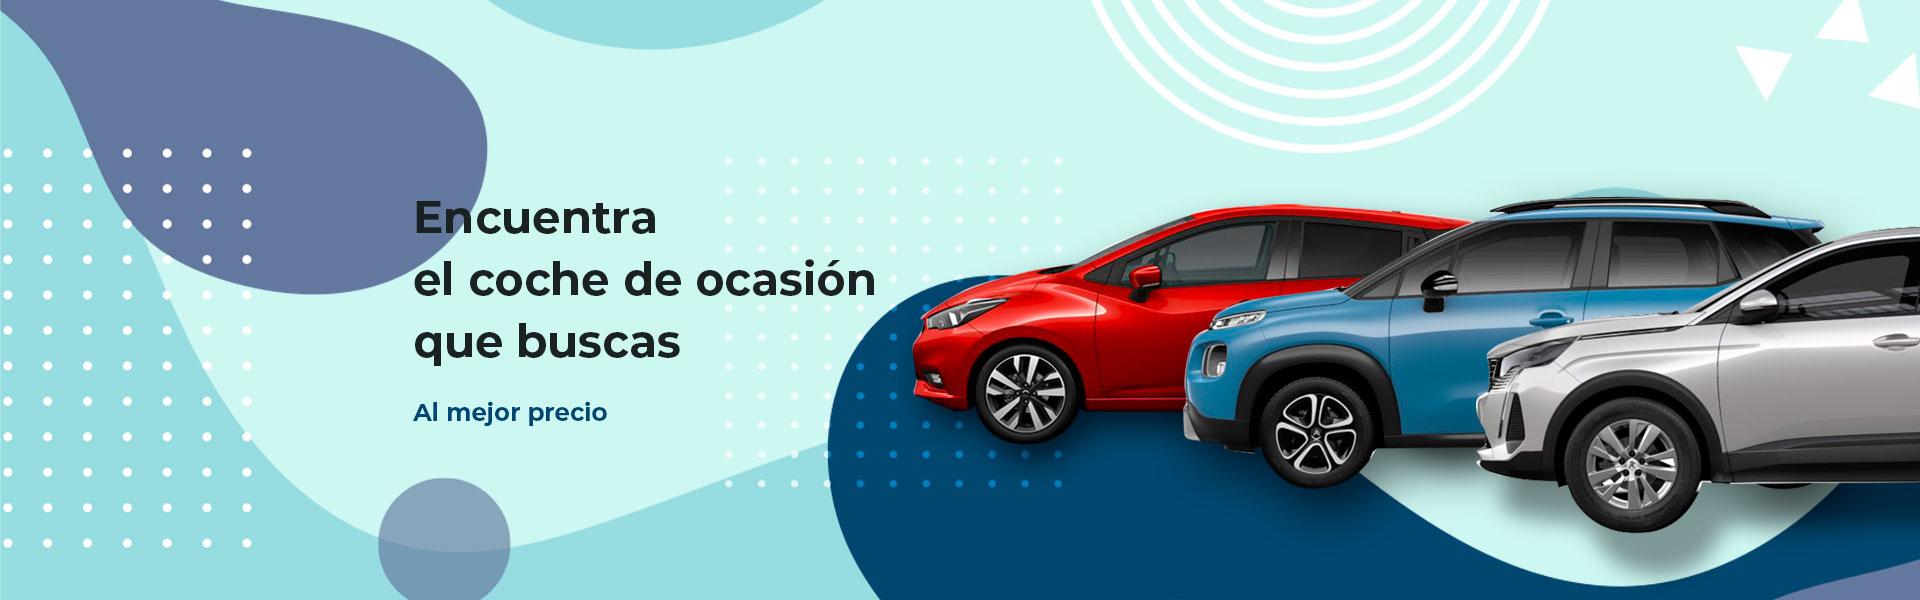 slider-cab-banne-coches-ocasion